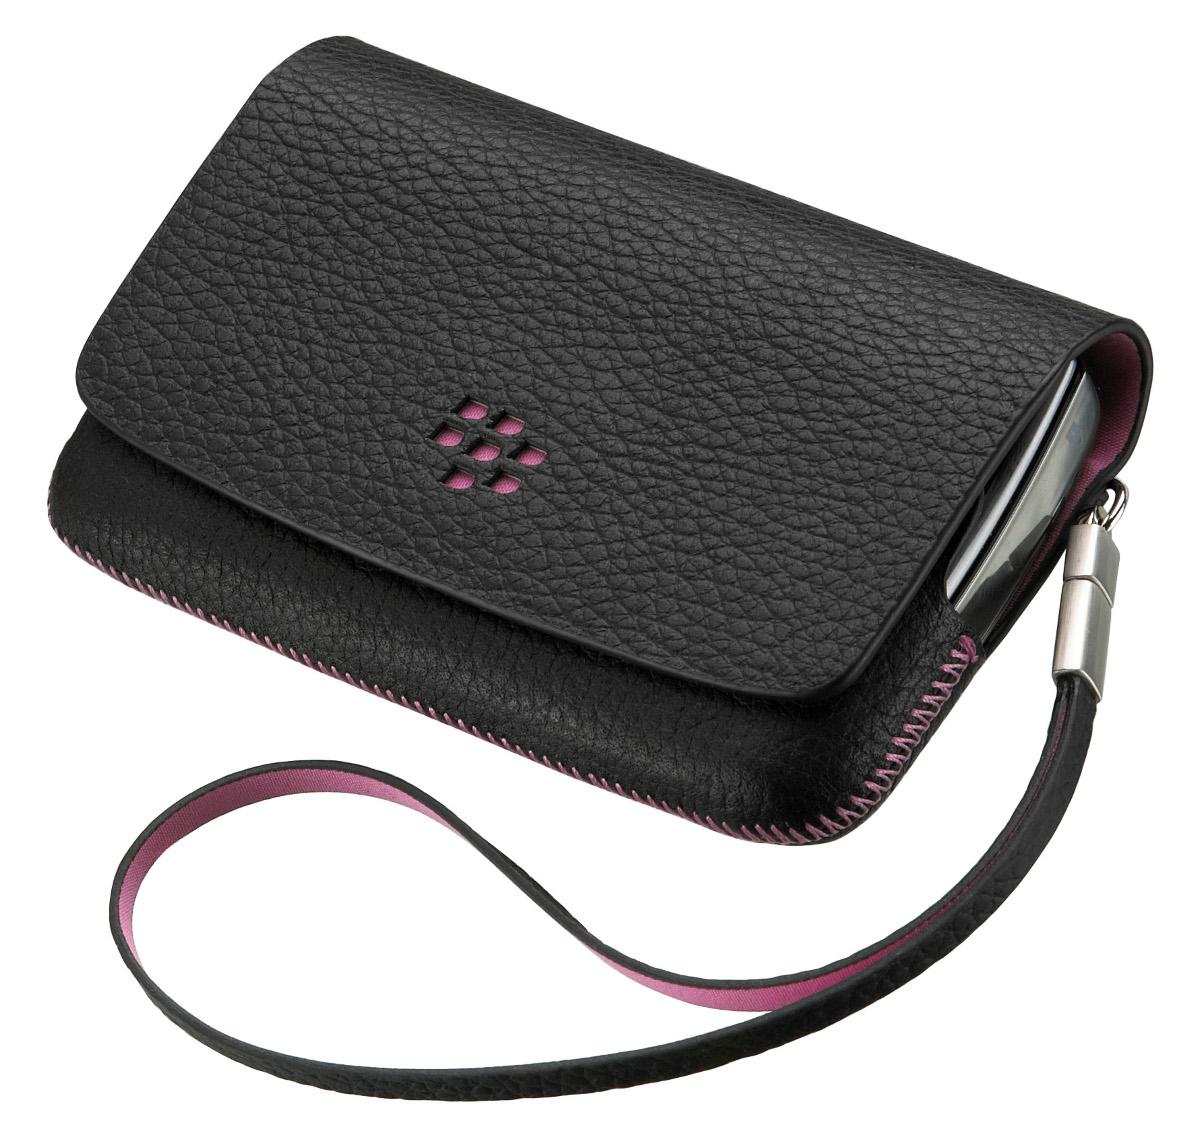 Etui Folio Noir BlackBerry 9800